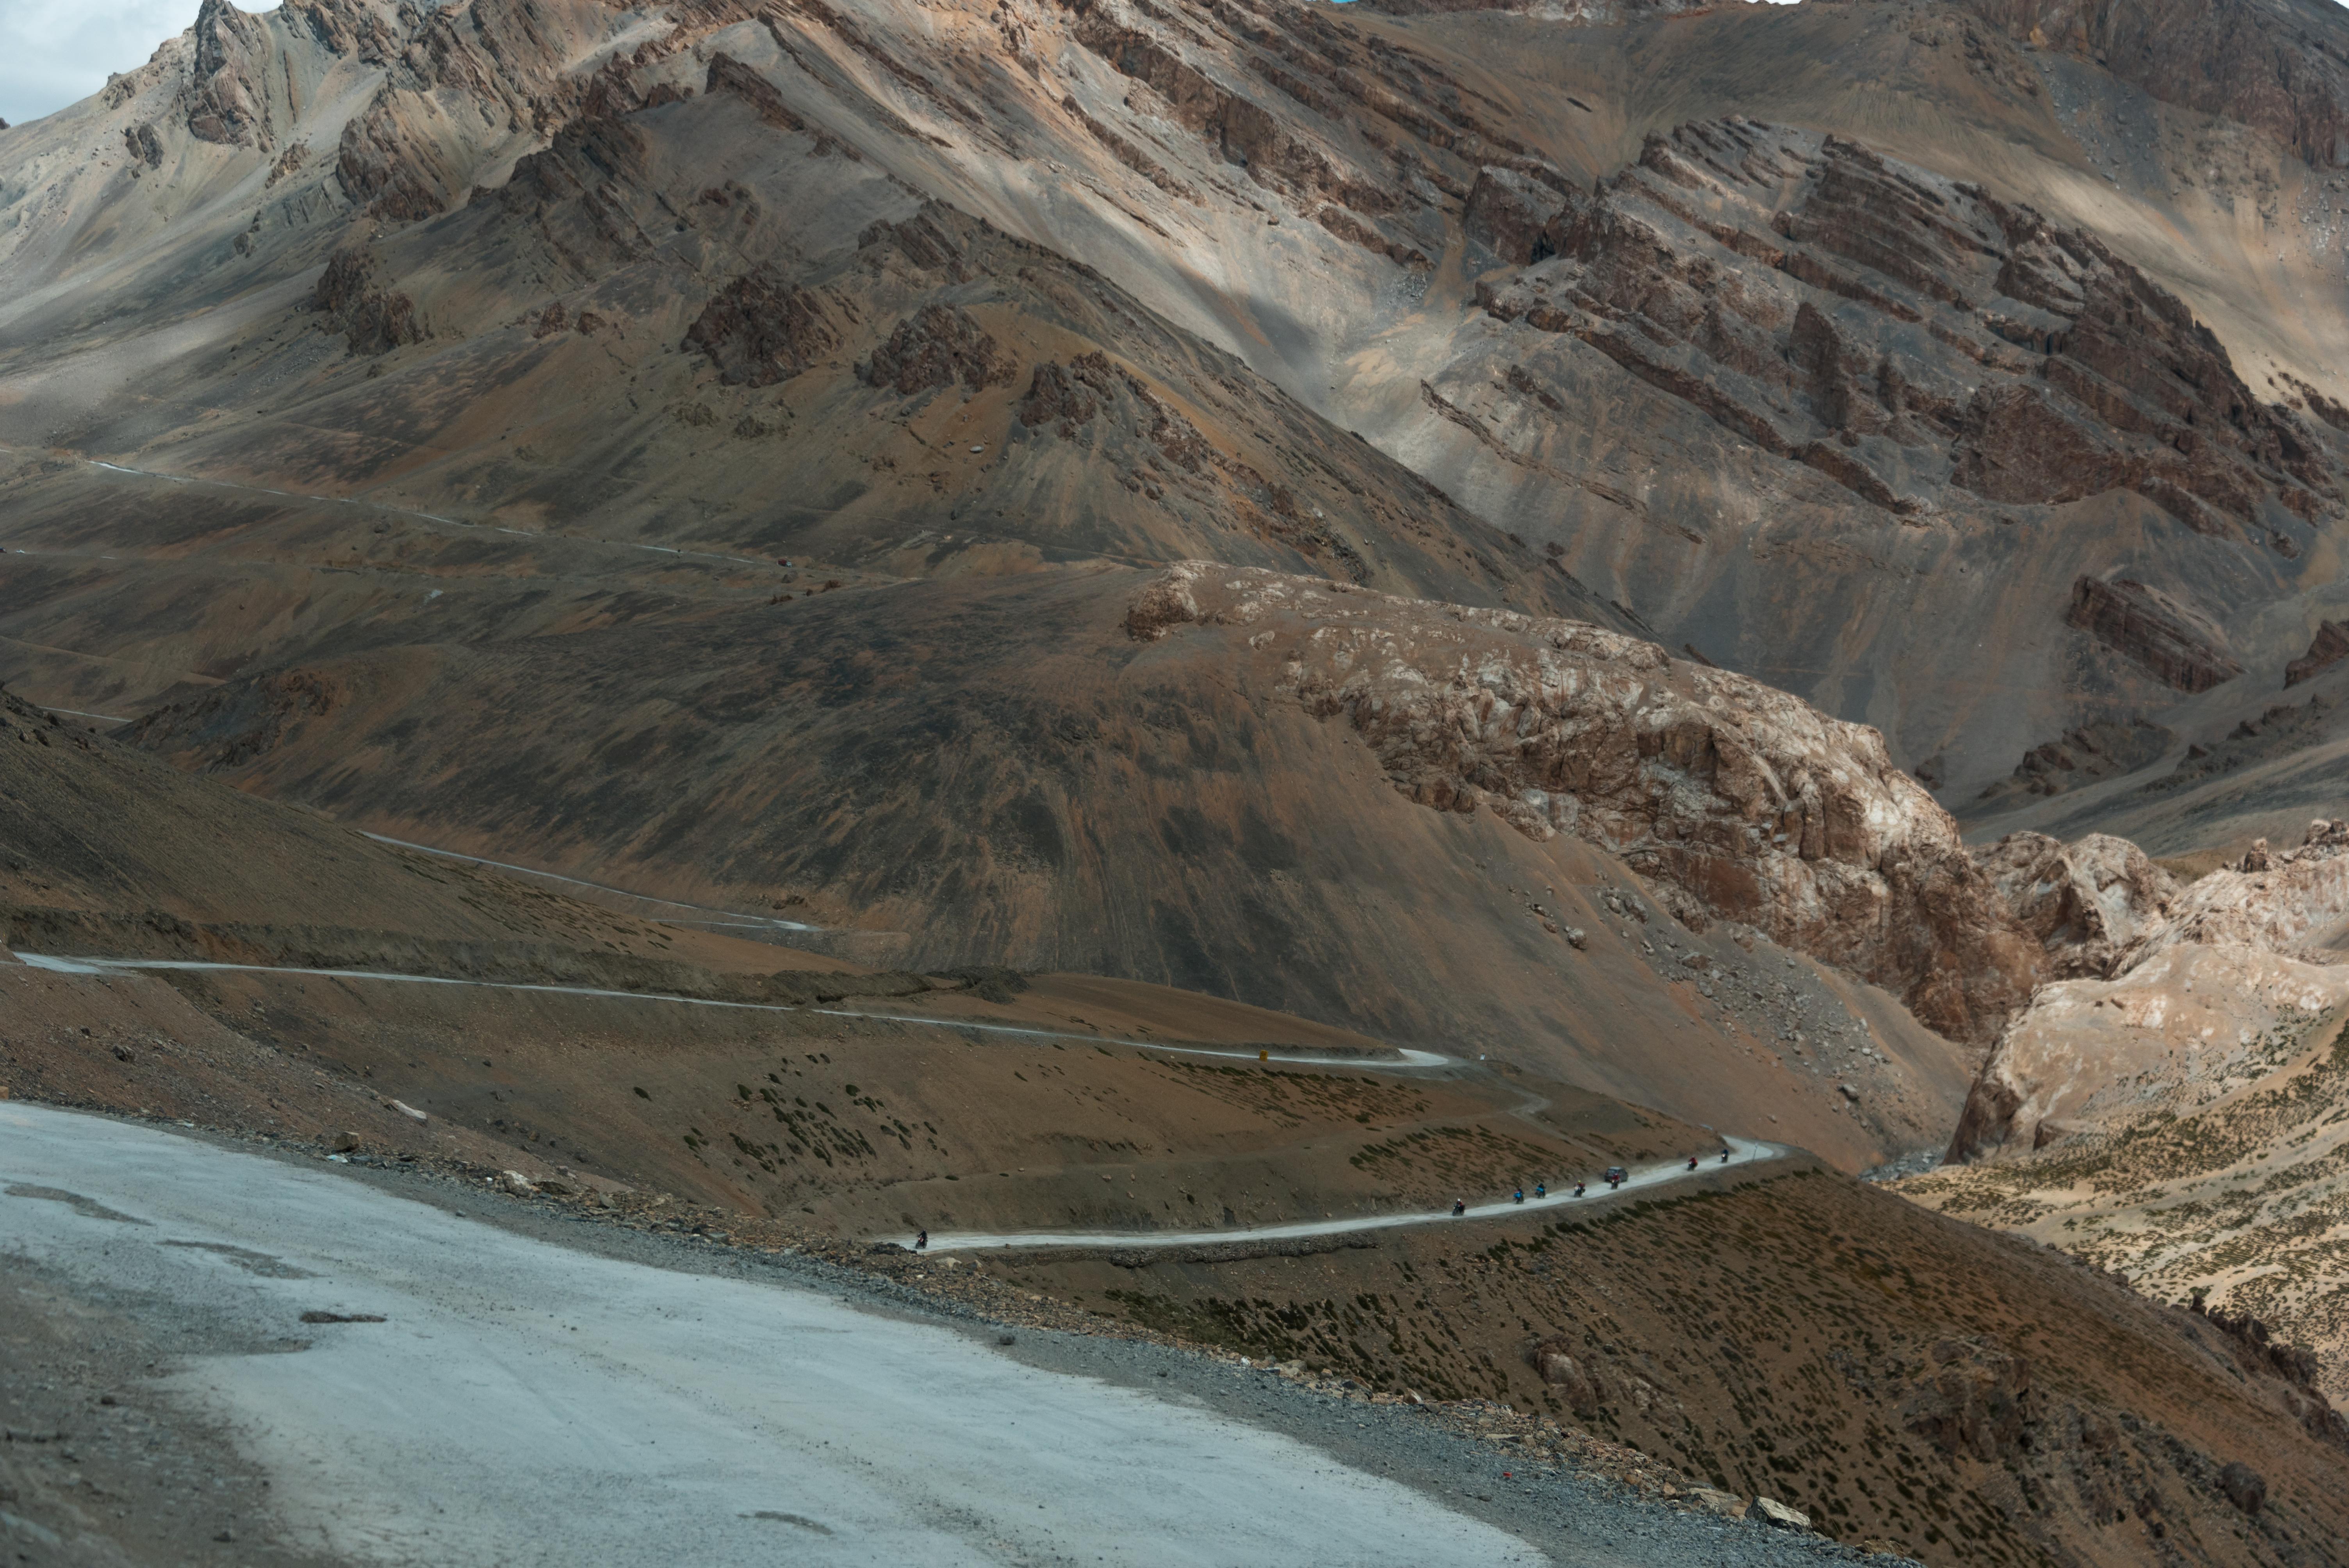 Hilly Roads Of The Ladakh Region